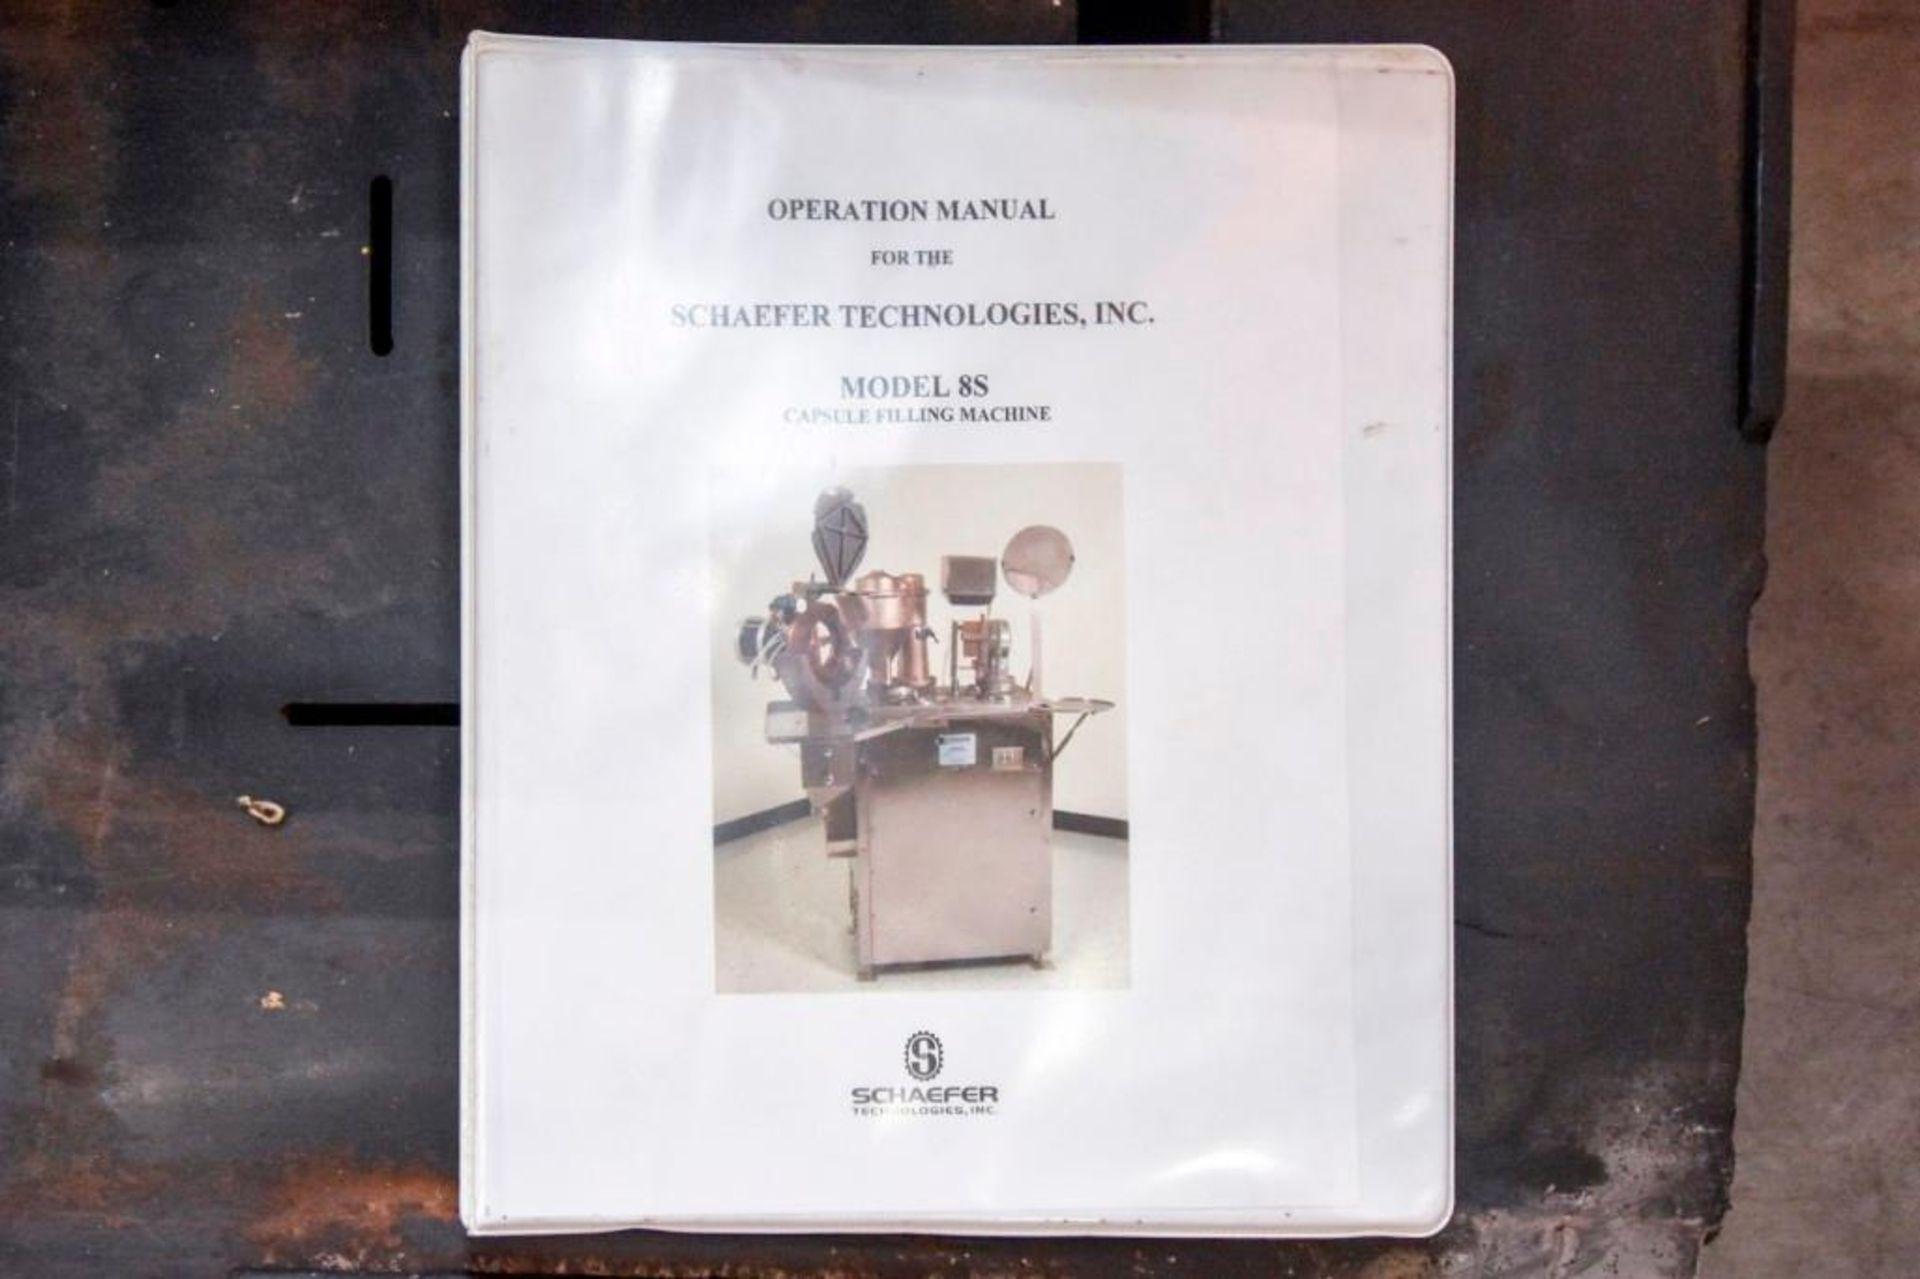 Semi-Automatic Encapsulator MDL 8S - Image 19 of 20